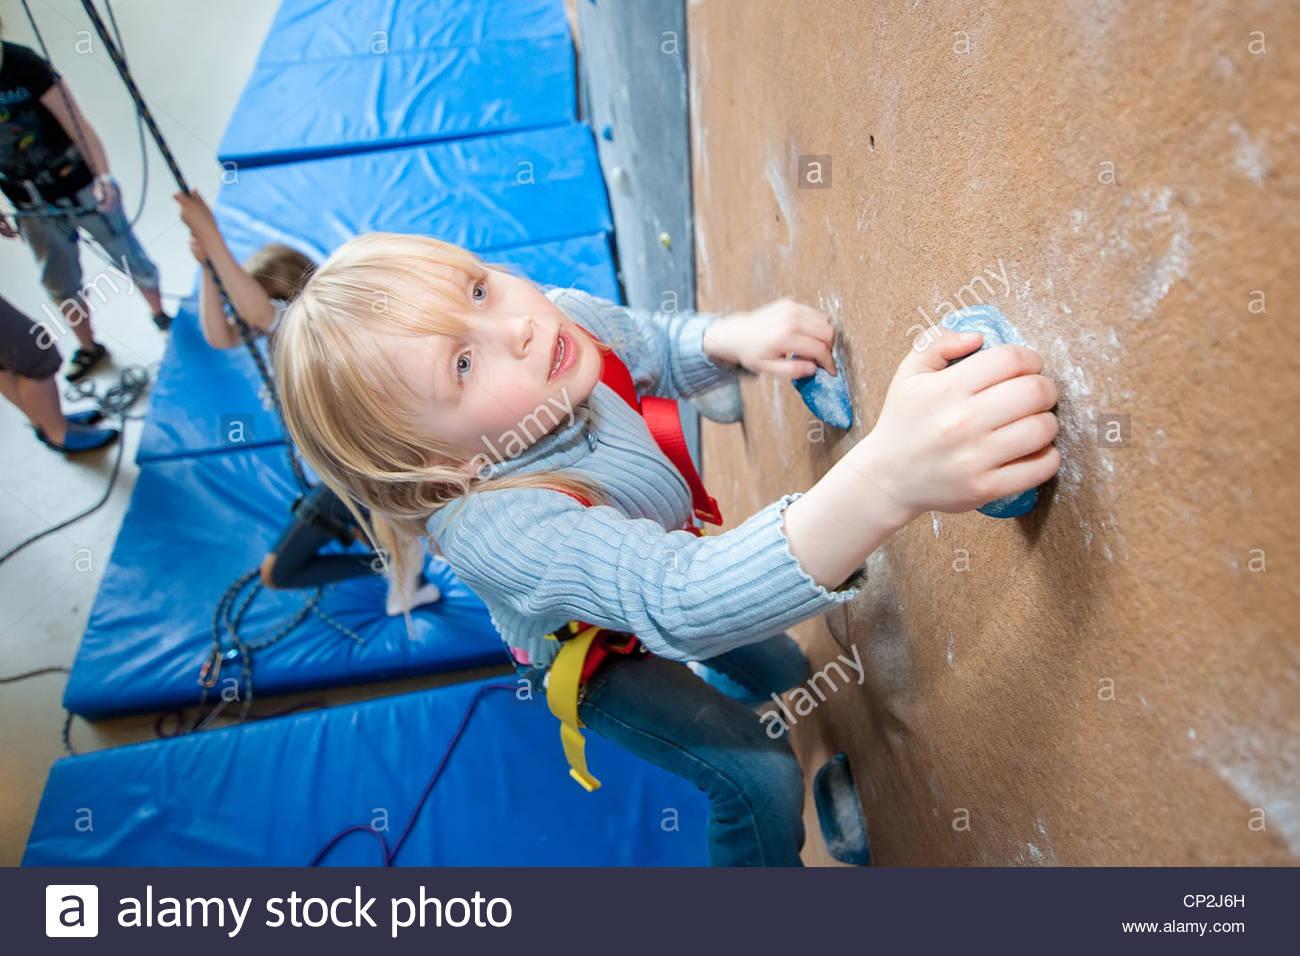 A little girl climbing in an indoor climbing wall - Stock Image